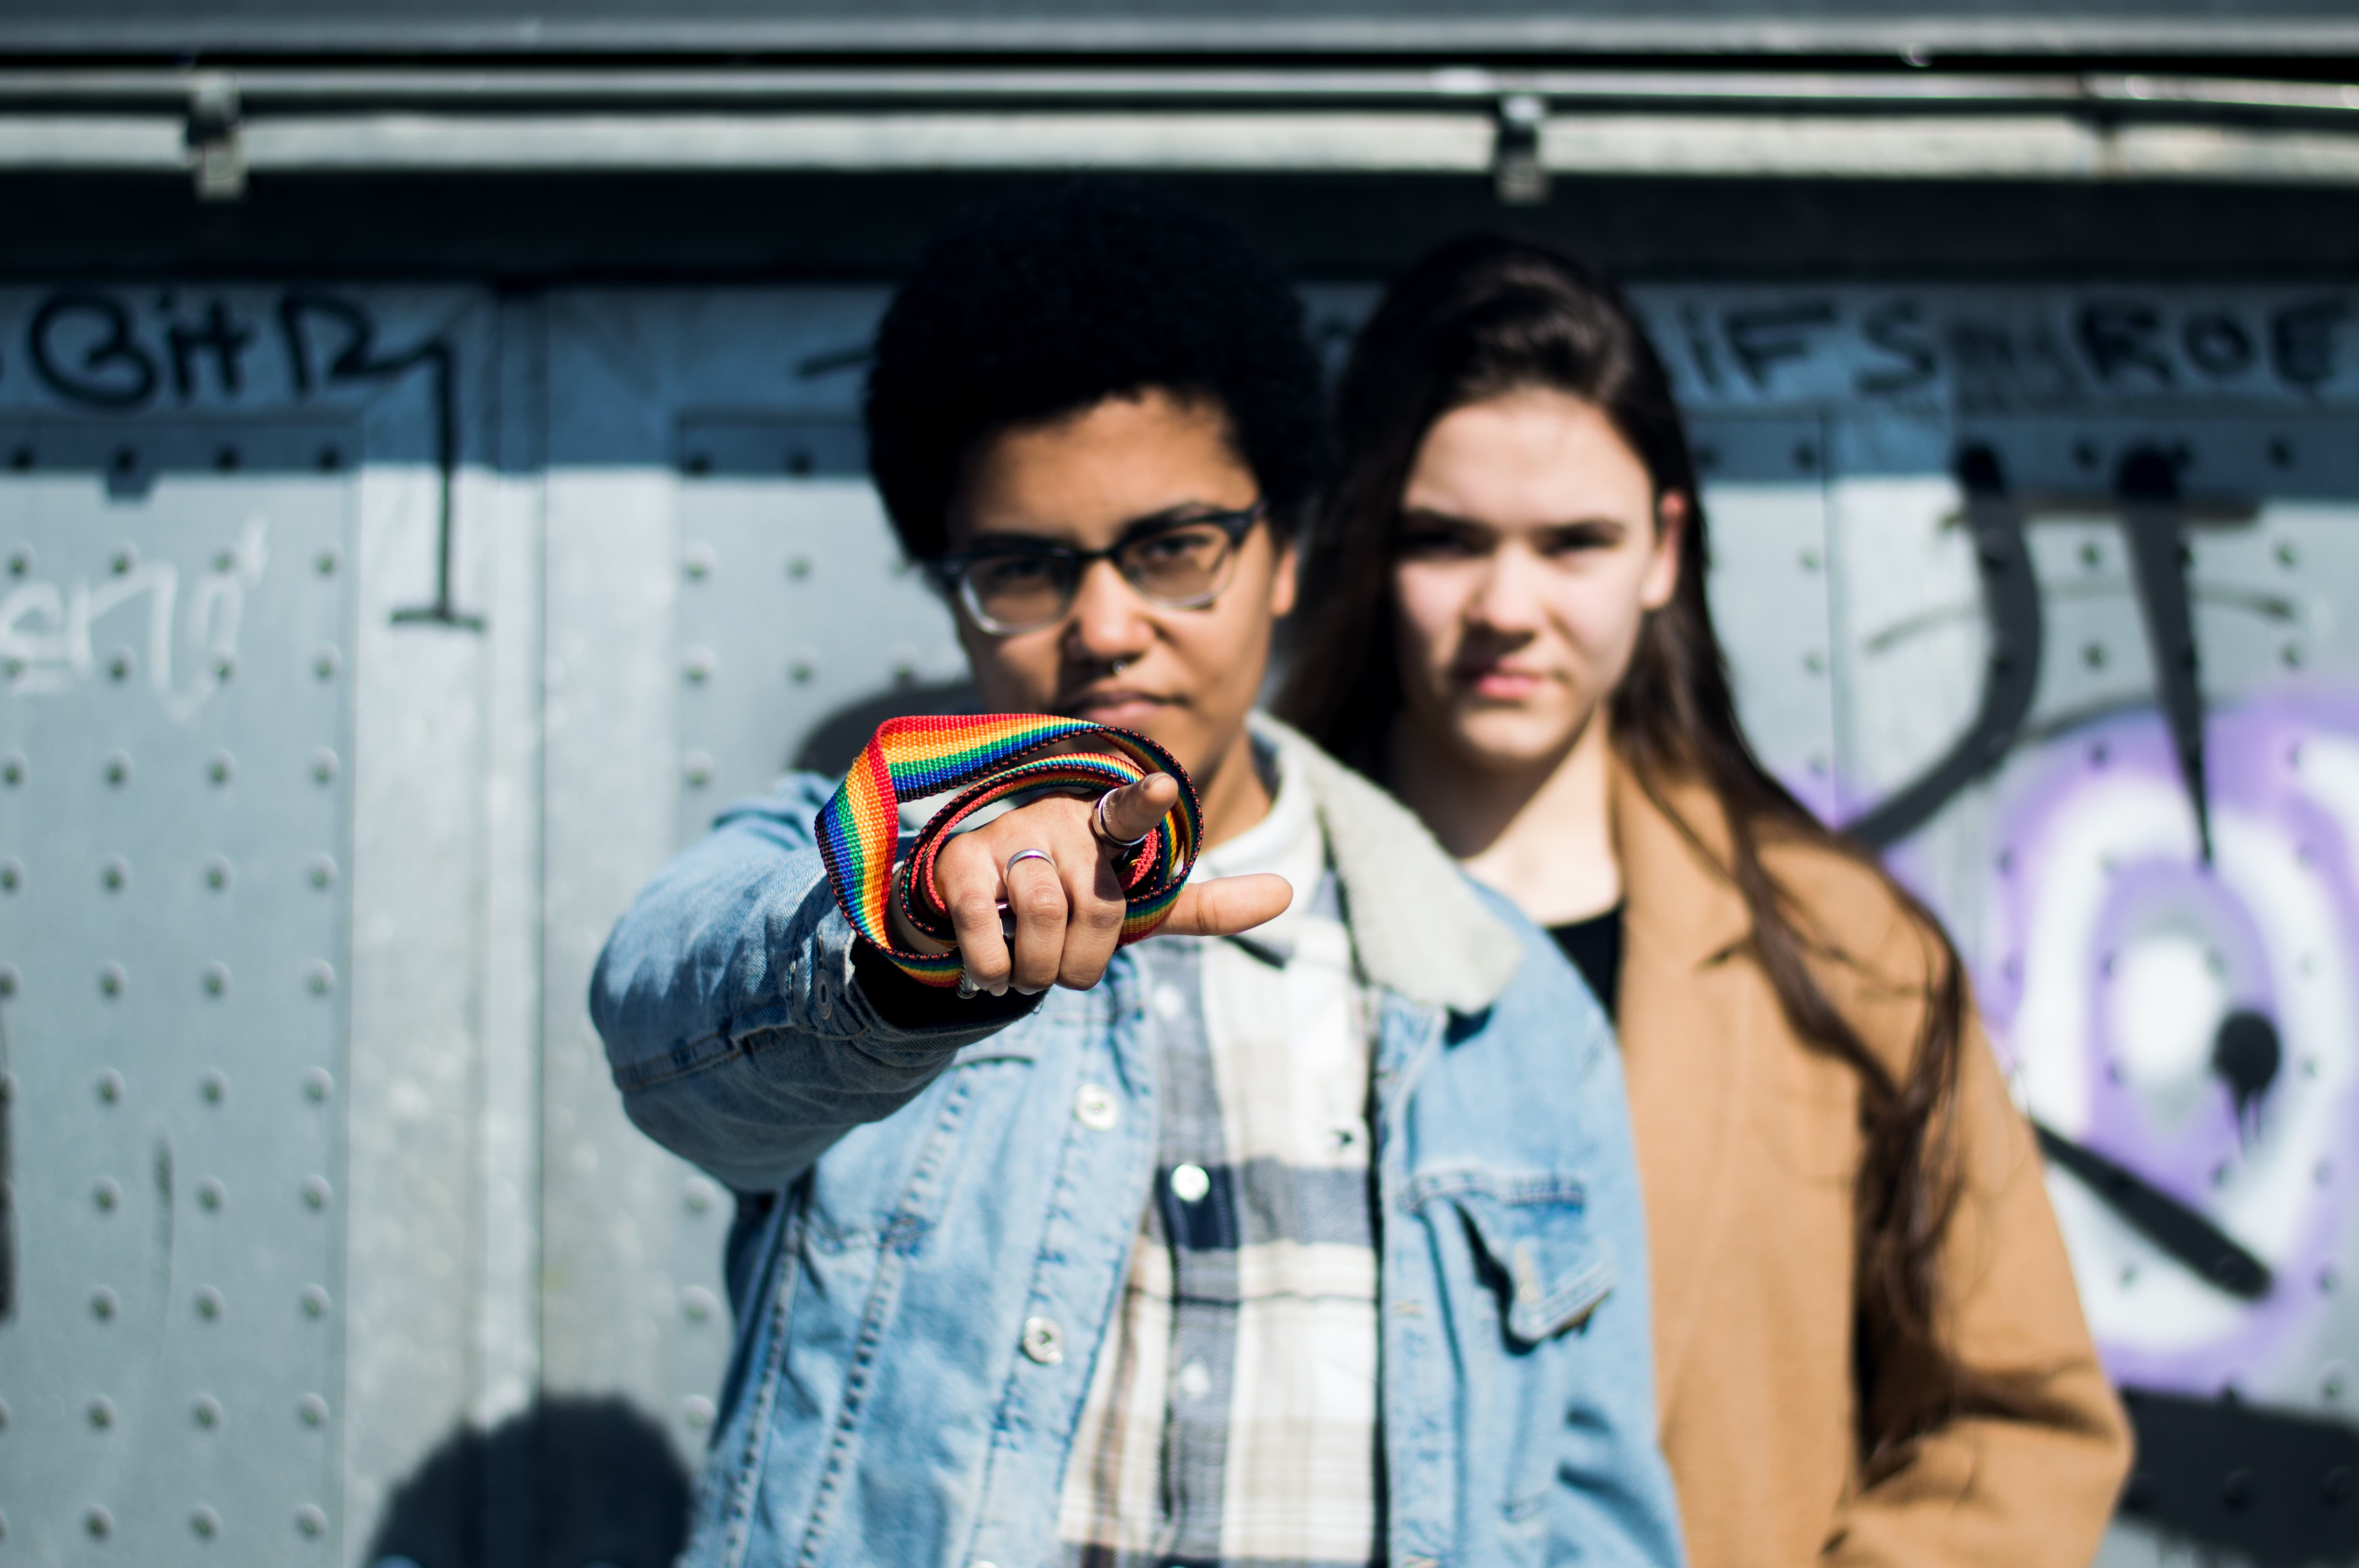 Two girls with rainbow lanyard